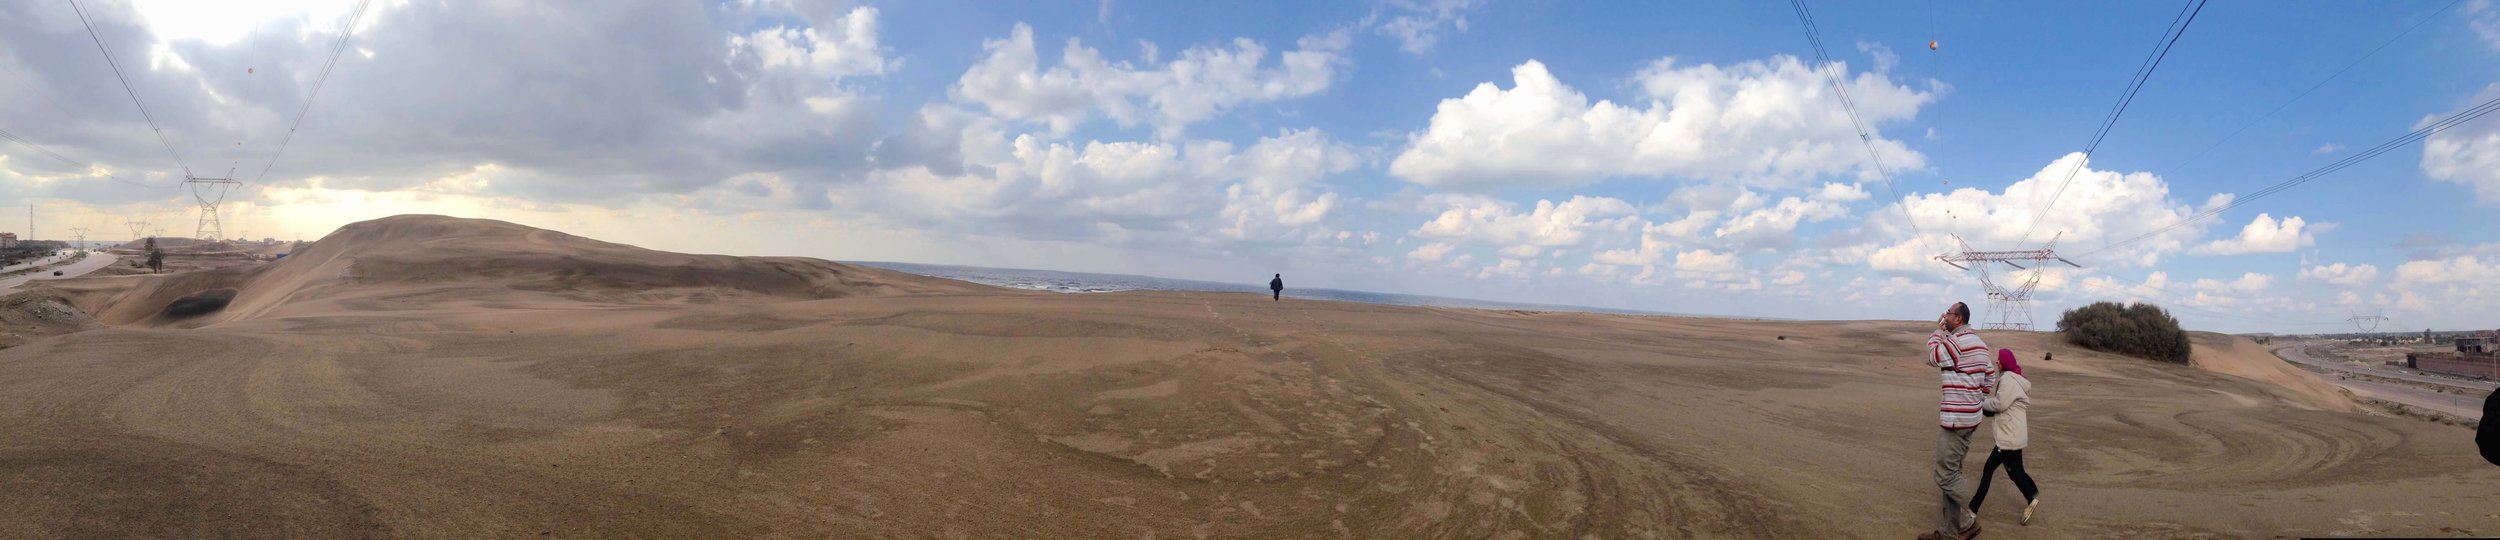 sand dunes activate.jpg